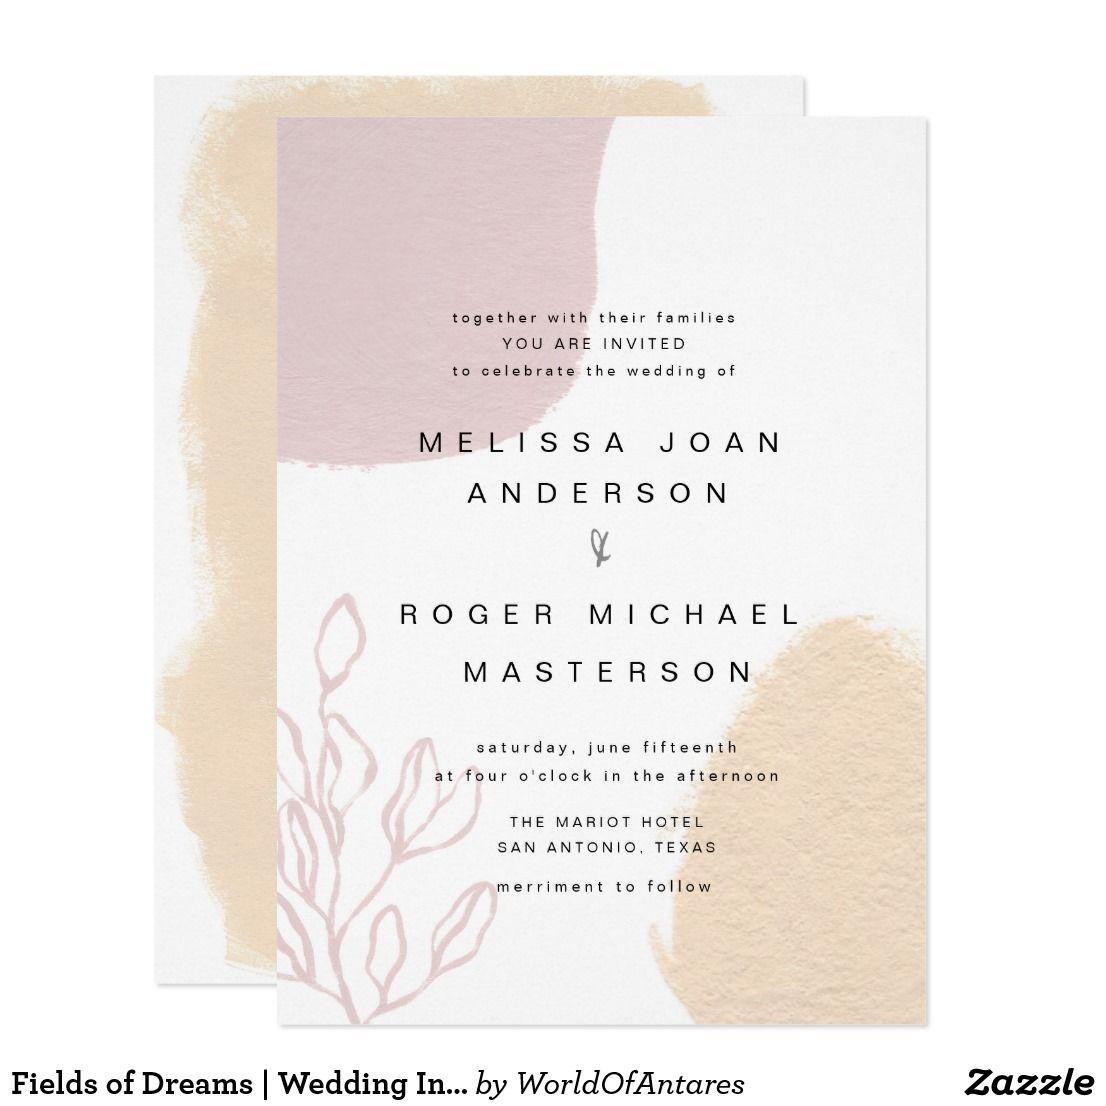 Zazzle Wedding Invitations.Fields Of Dreams Wedding Invitation Zazzle Com In 2019 Wedding